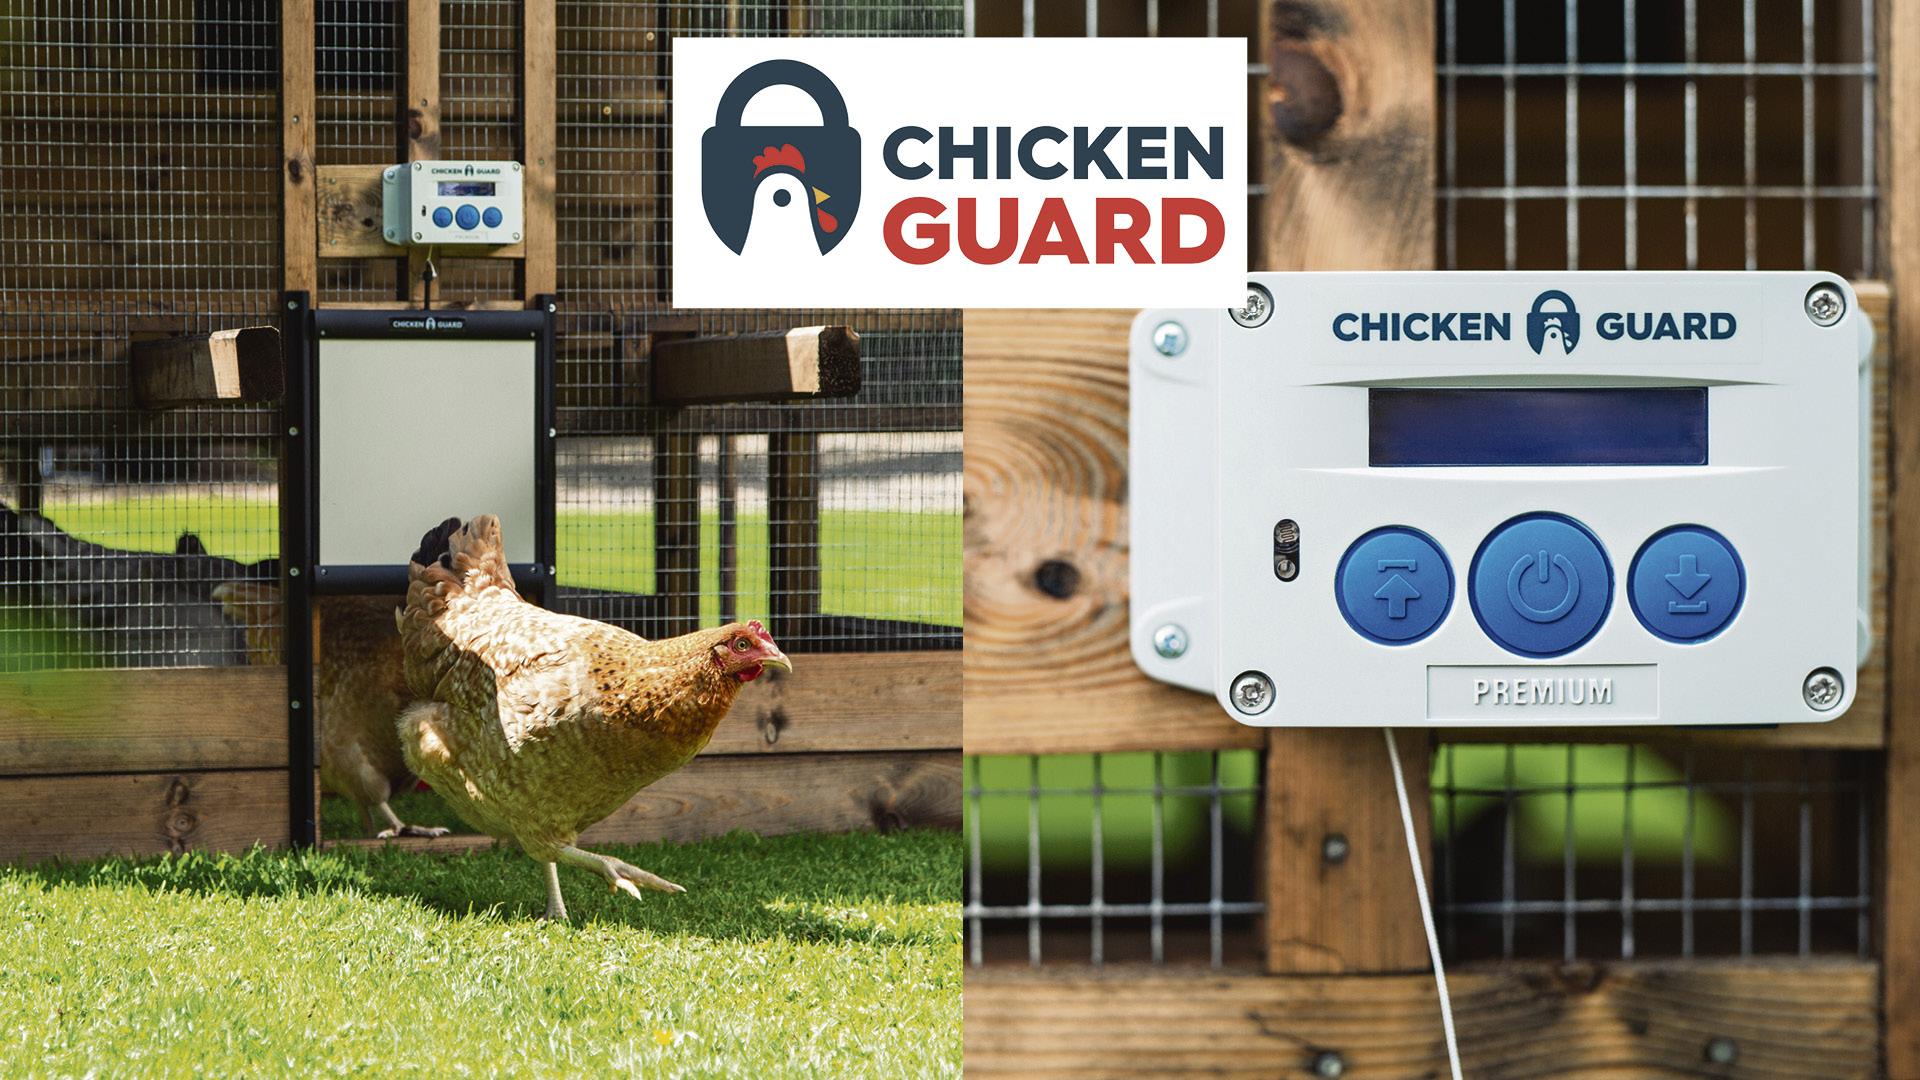 Win a ChickenGuard© Locking Combi  Premium Kit Worth £165.99!